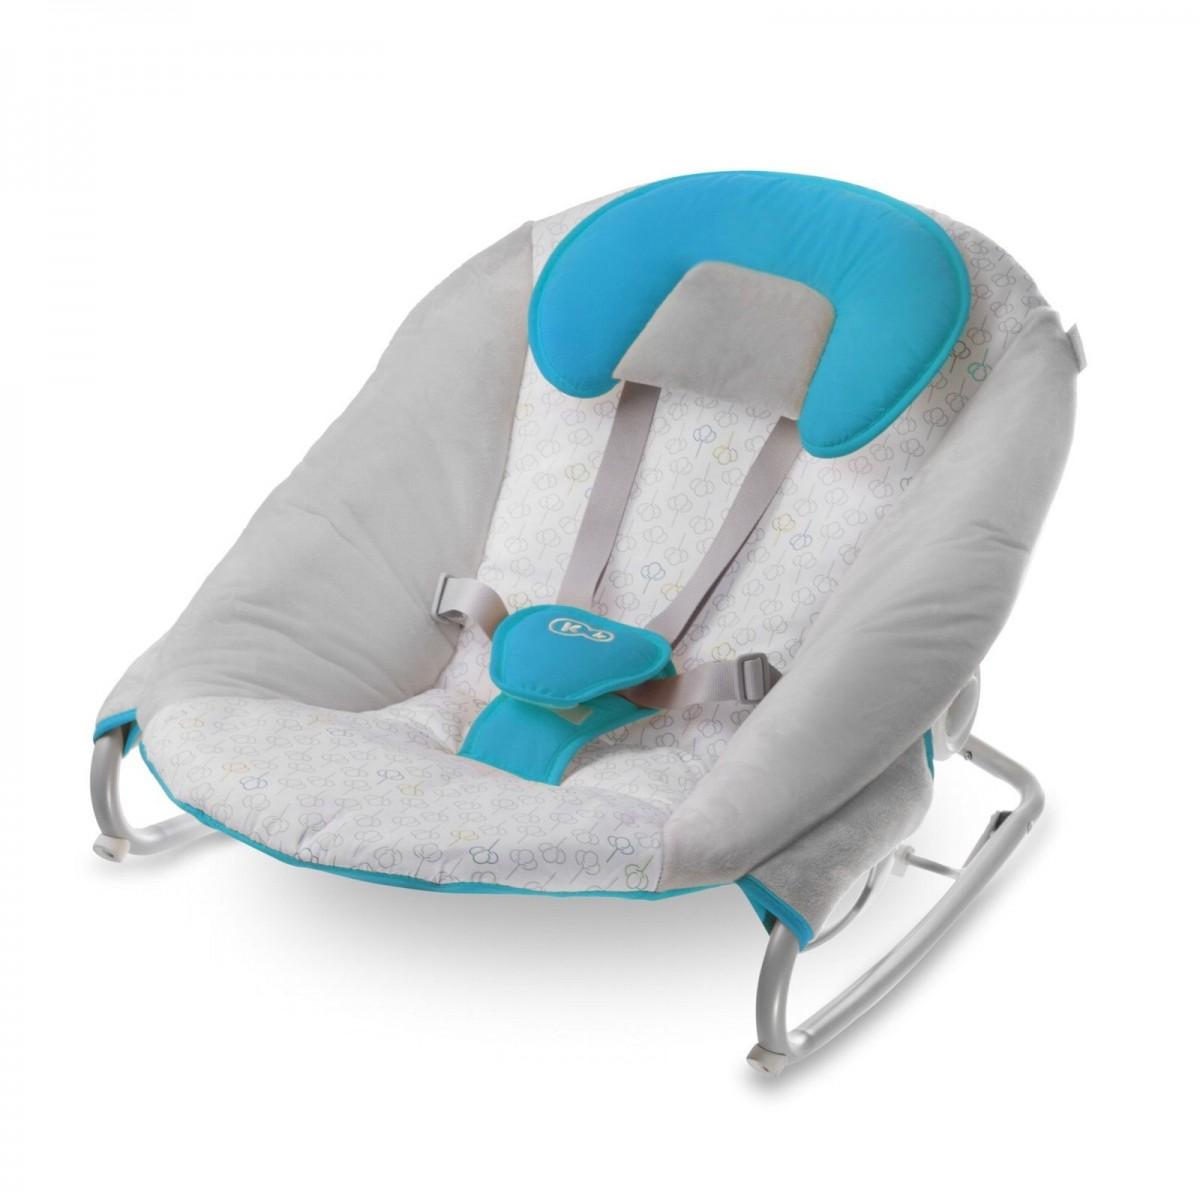 kinderkraft baby wippe gino up. Black Bedroom Furniture Sets. Home Design Ideas